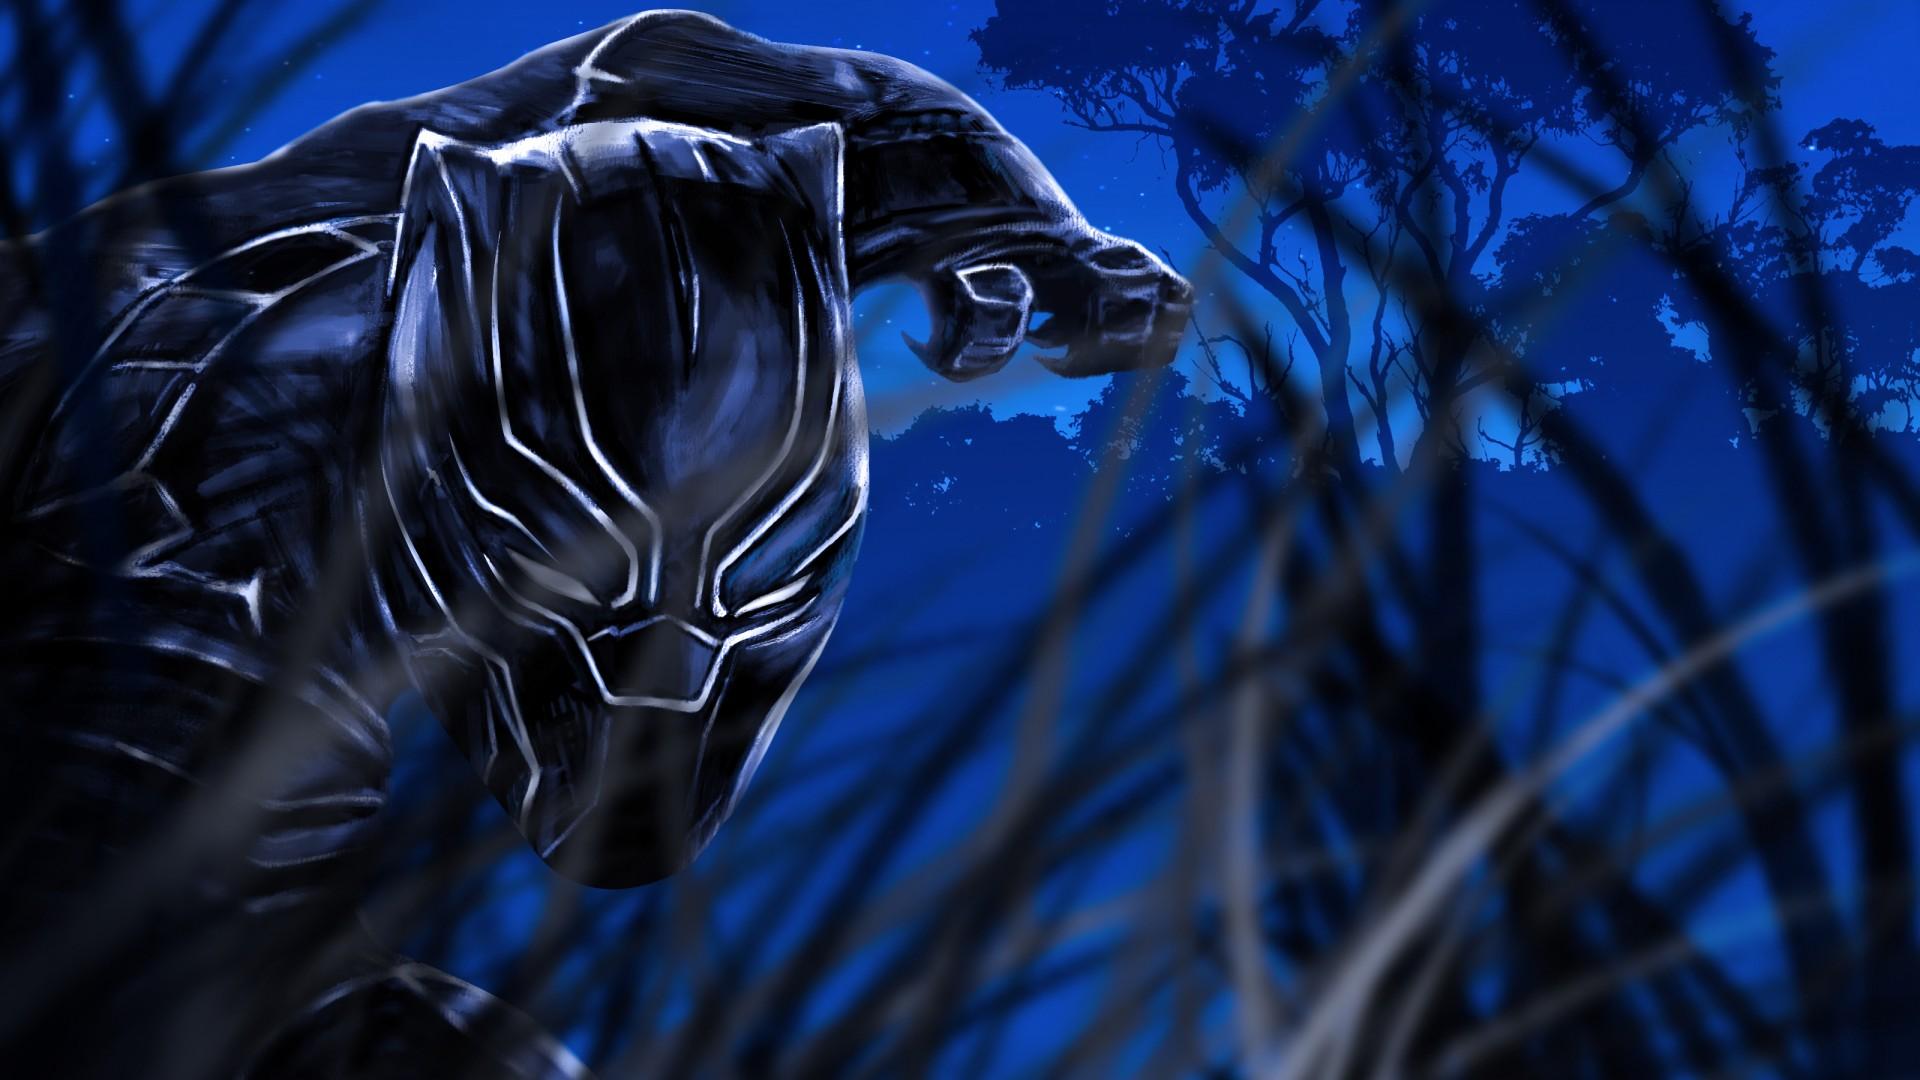 Apple Iphone X Wallpaper Download Black Panther Fan Art Wallpapers Hd Wallpapers Id 26693